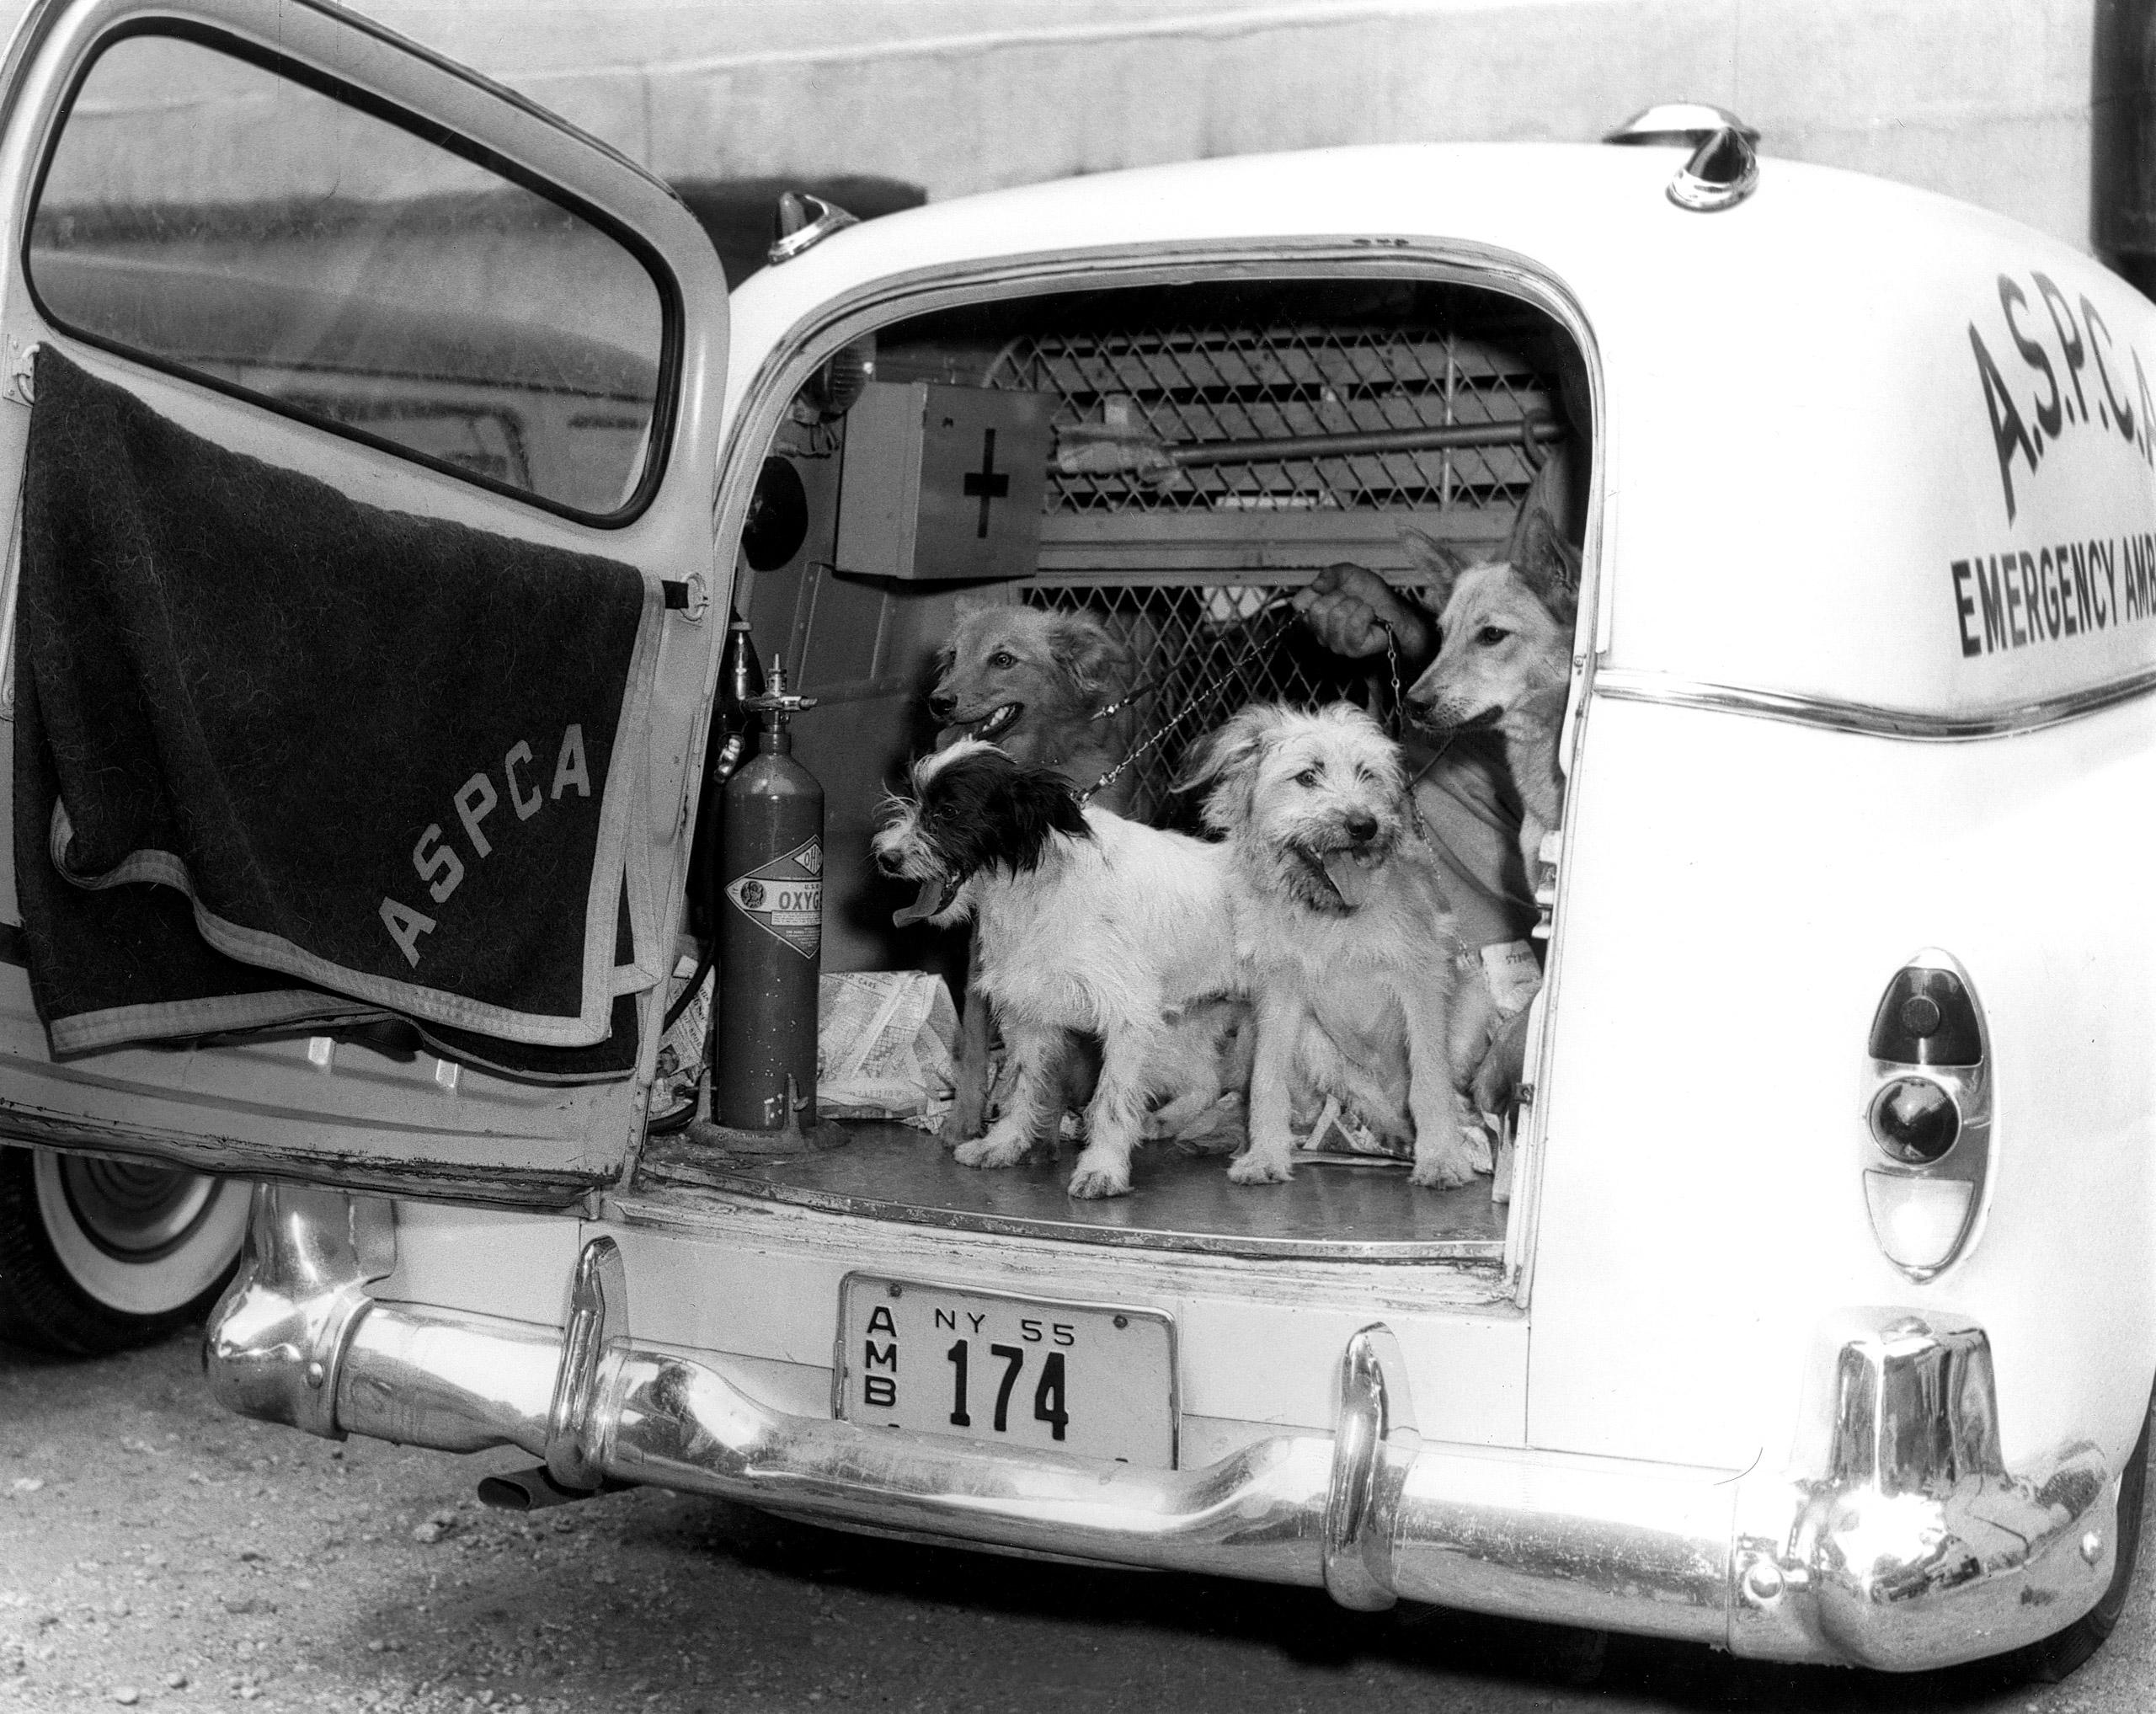 Dogs in ASPCA rescue vehicle, 1955.